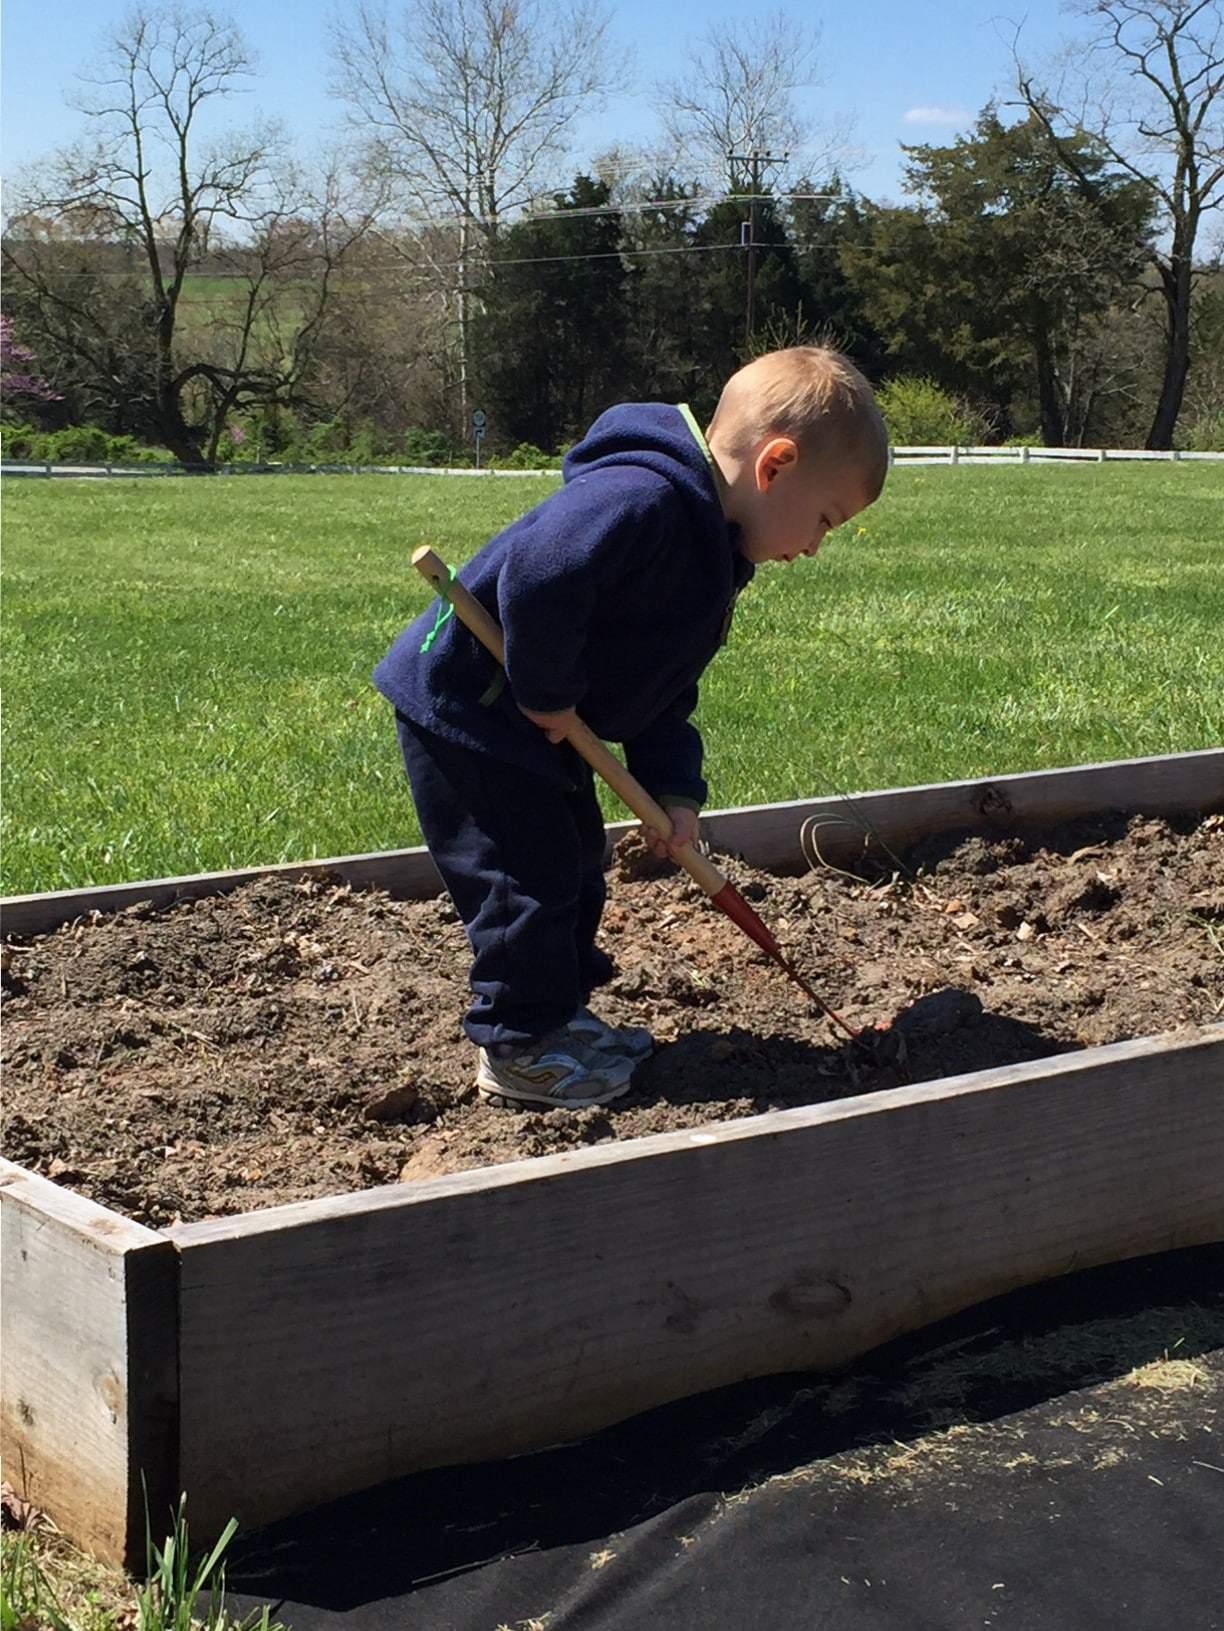 A boy preparing a planter for seeds